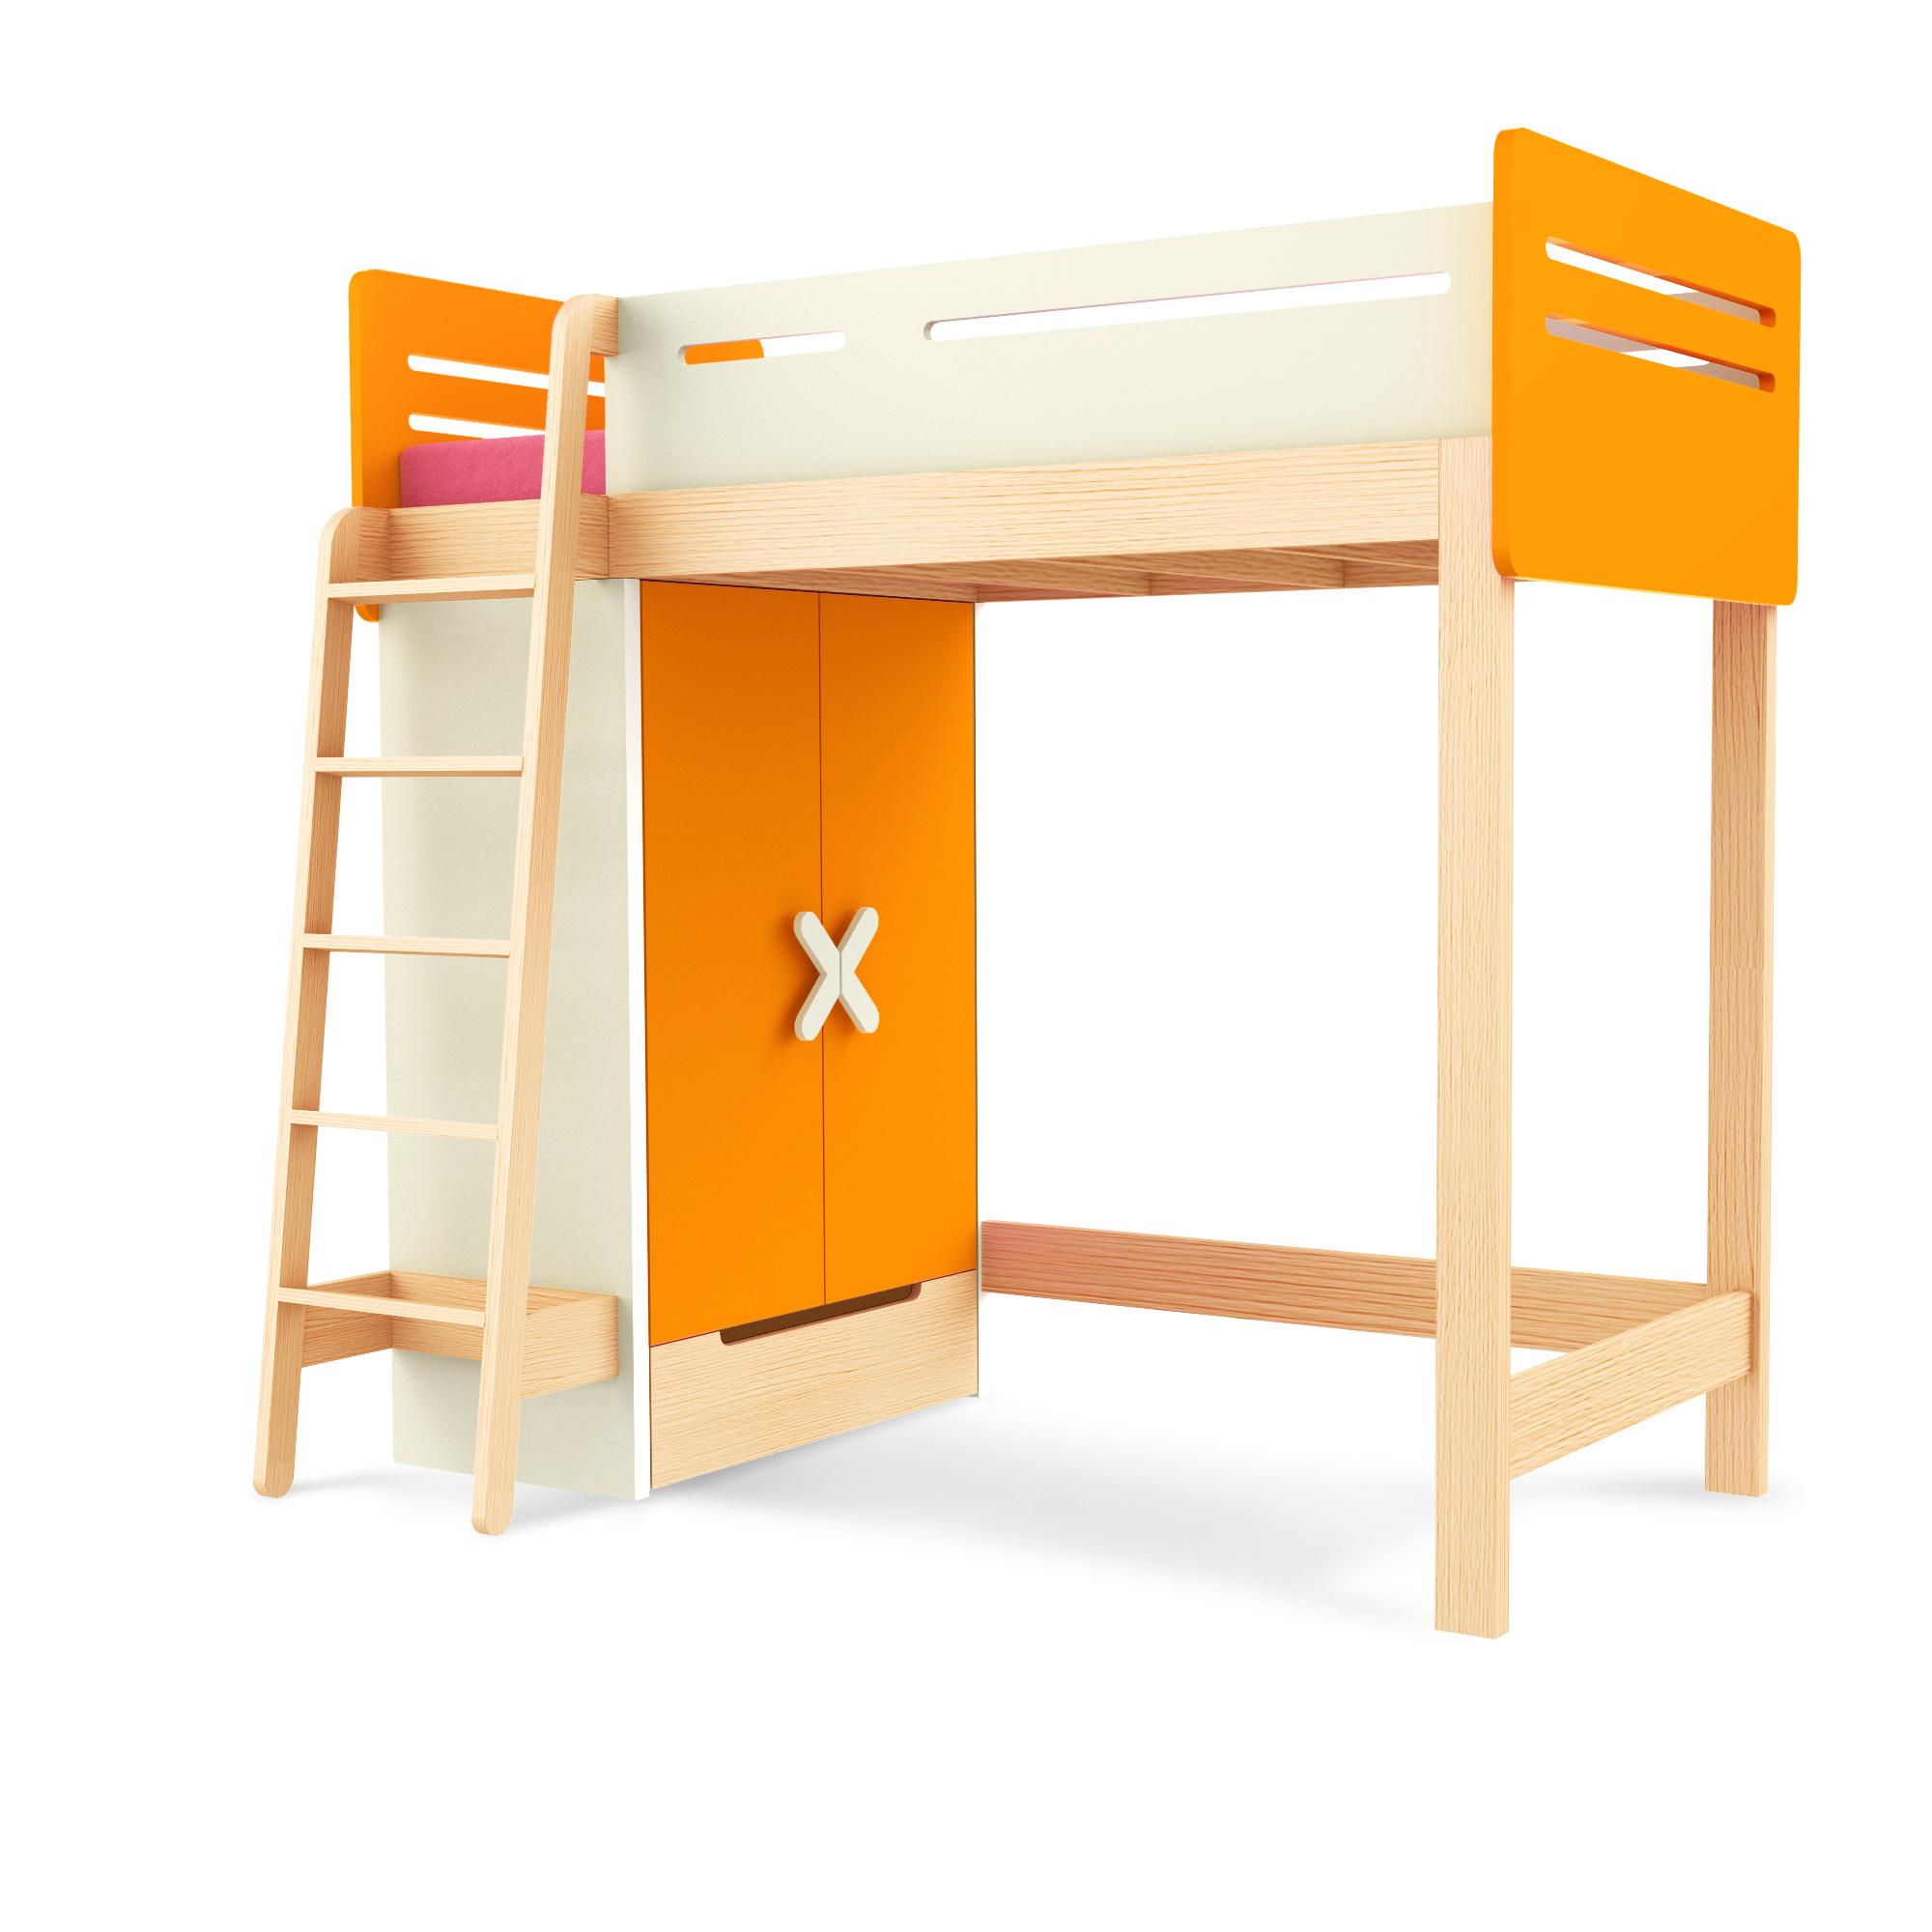 Hochbett Simple Orange Leiter Rechts, Timoore